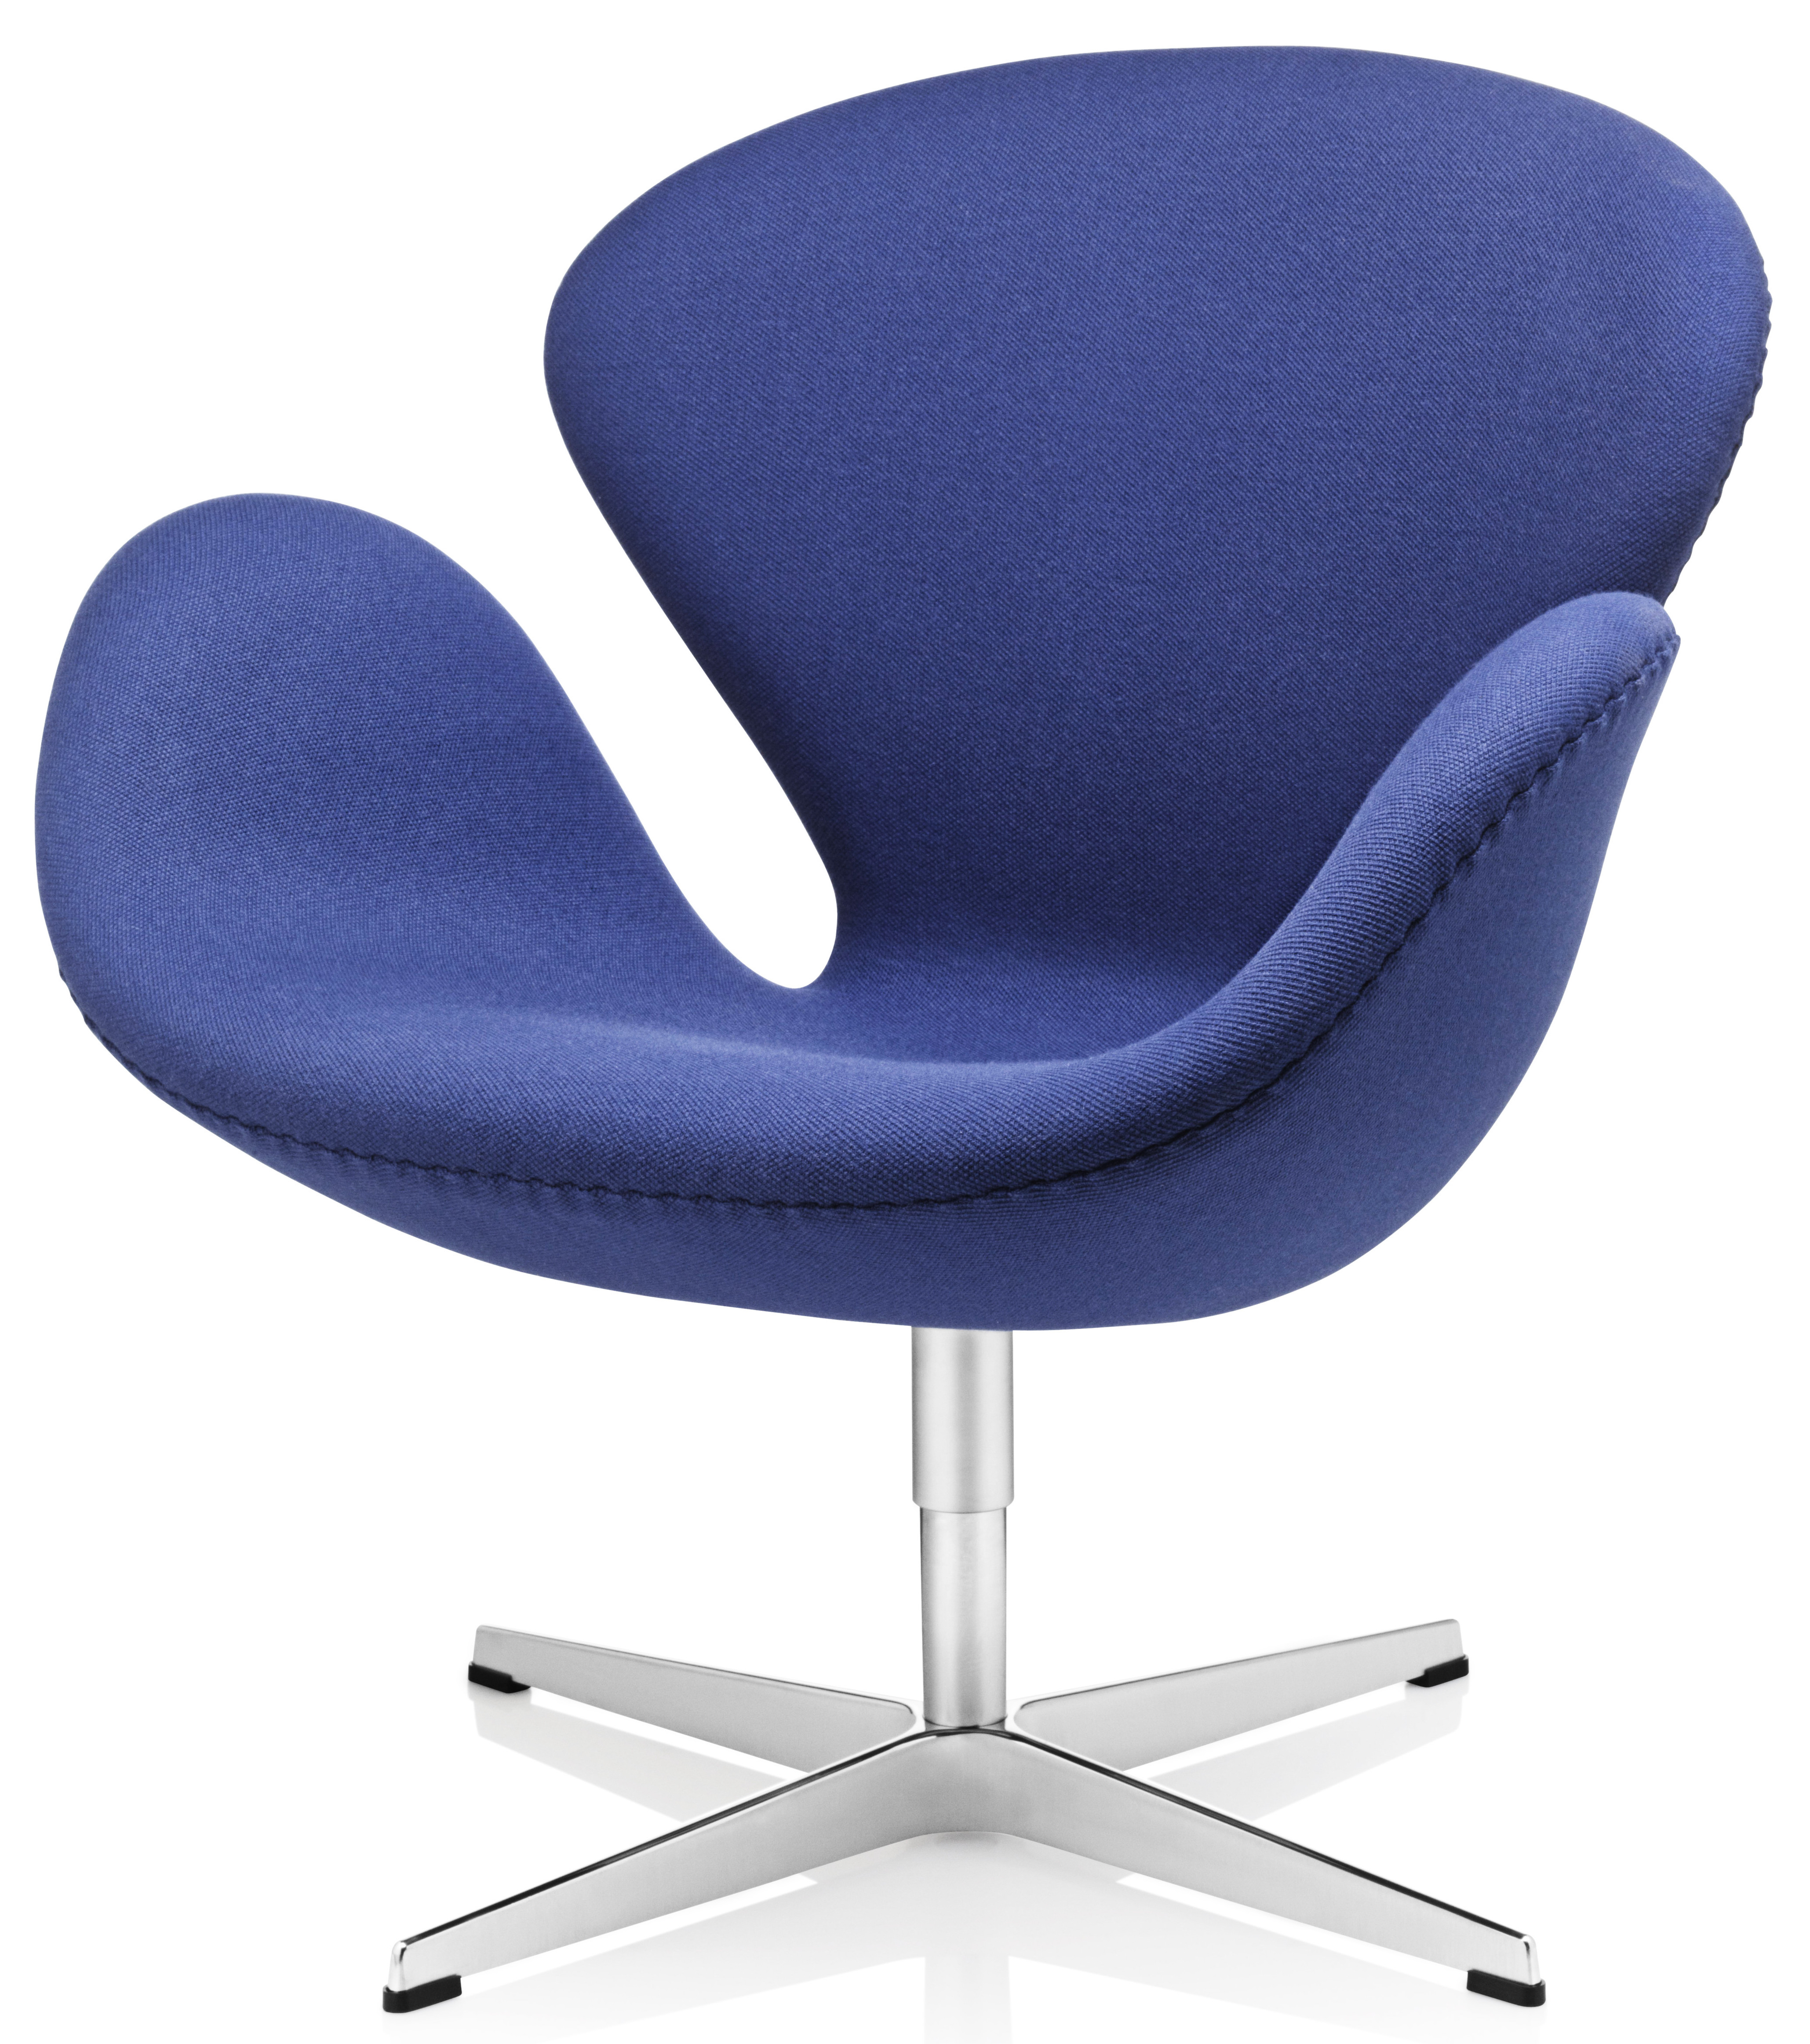 Pleasant Fritz Hansen Swan Chair Design Arne Jacobsen 1958 Evergreenethics Interior Chair Design Evergreenethicsorg